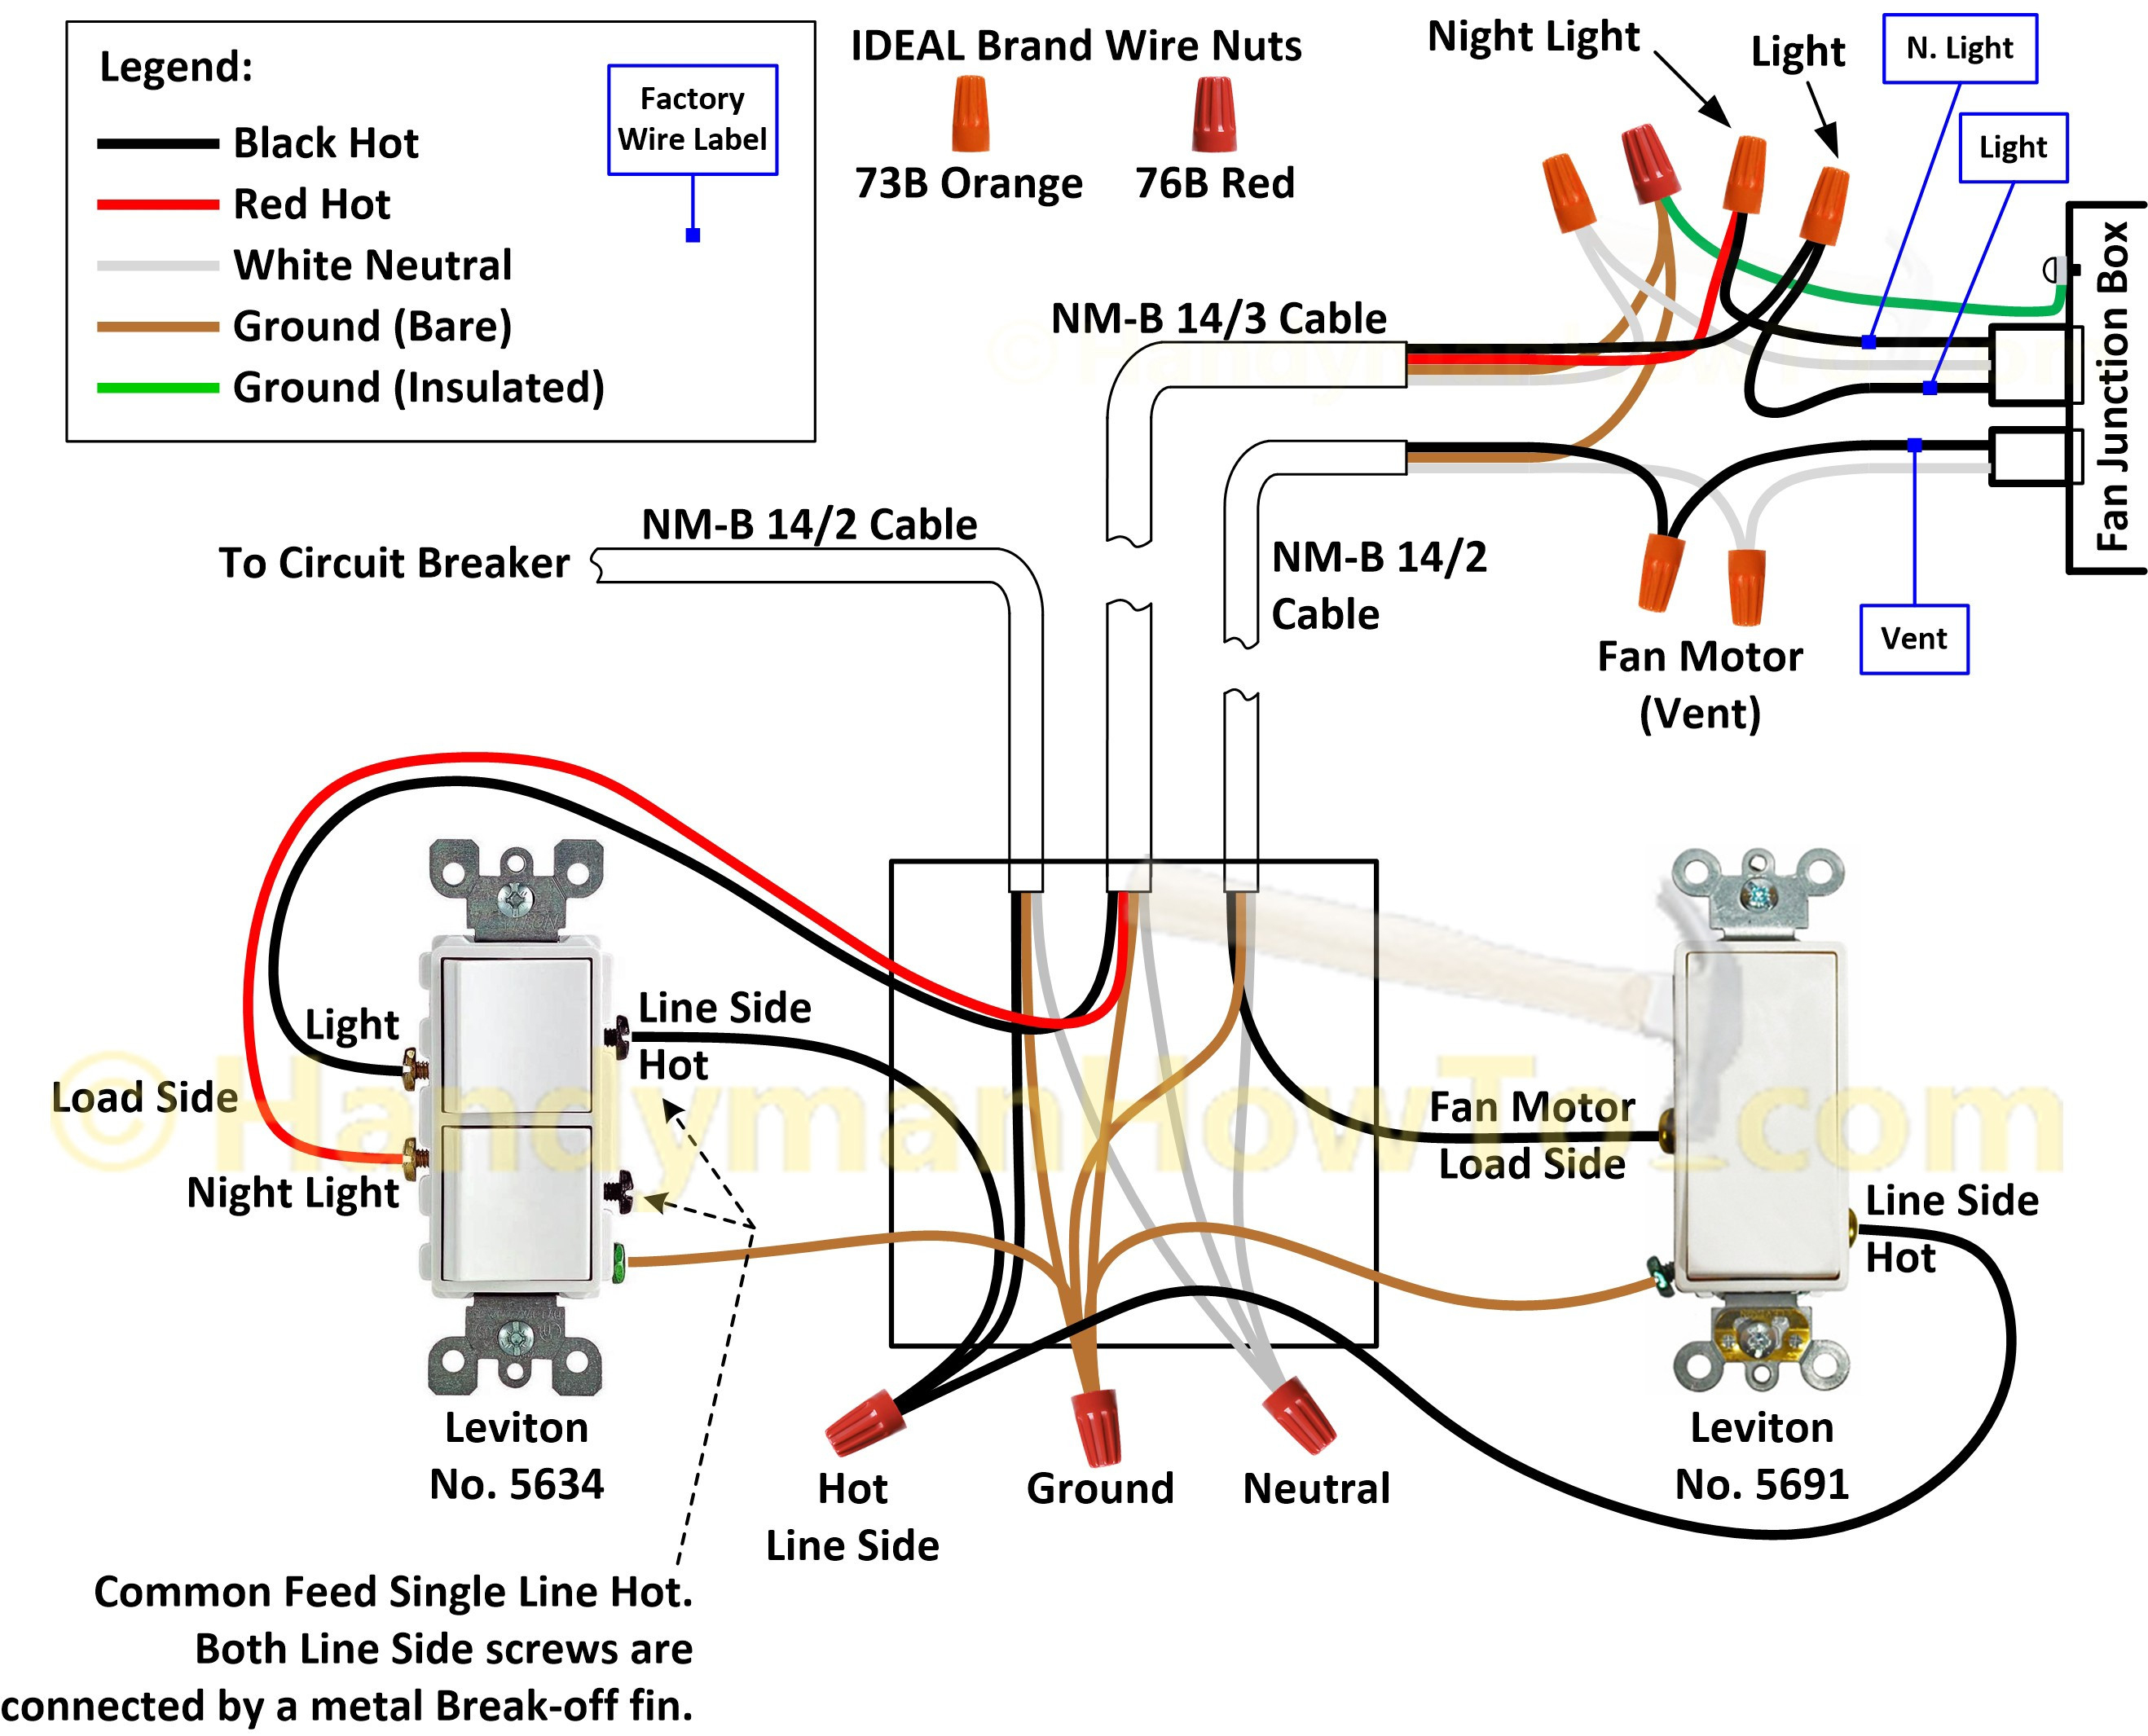 Leviton Double Switch Wiring Diagram | Manual E-Books - Leviton Double Switch Wiring Diagram